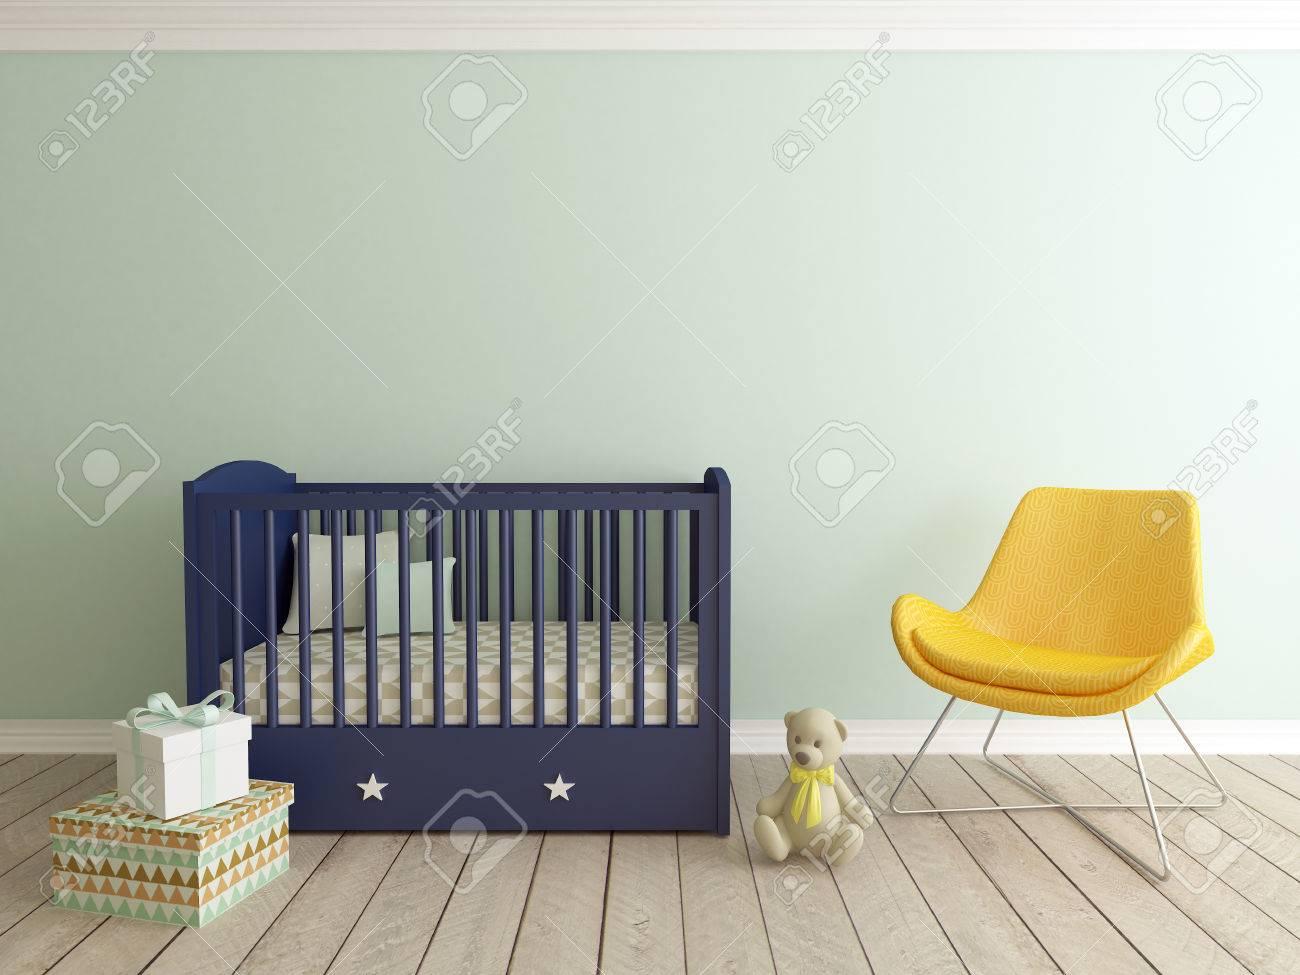 baby room interior - 70928546